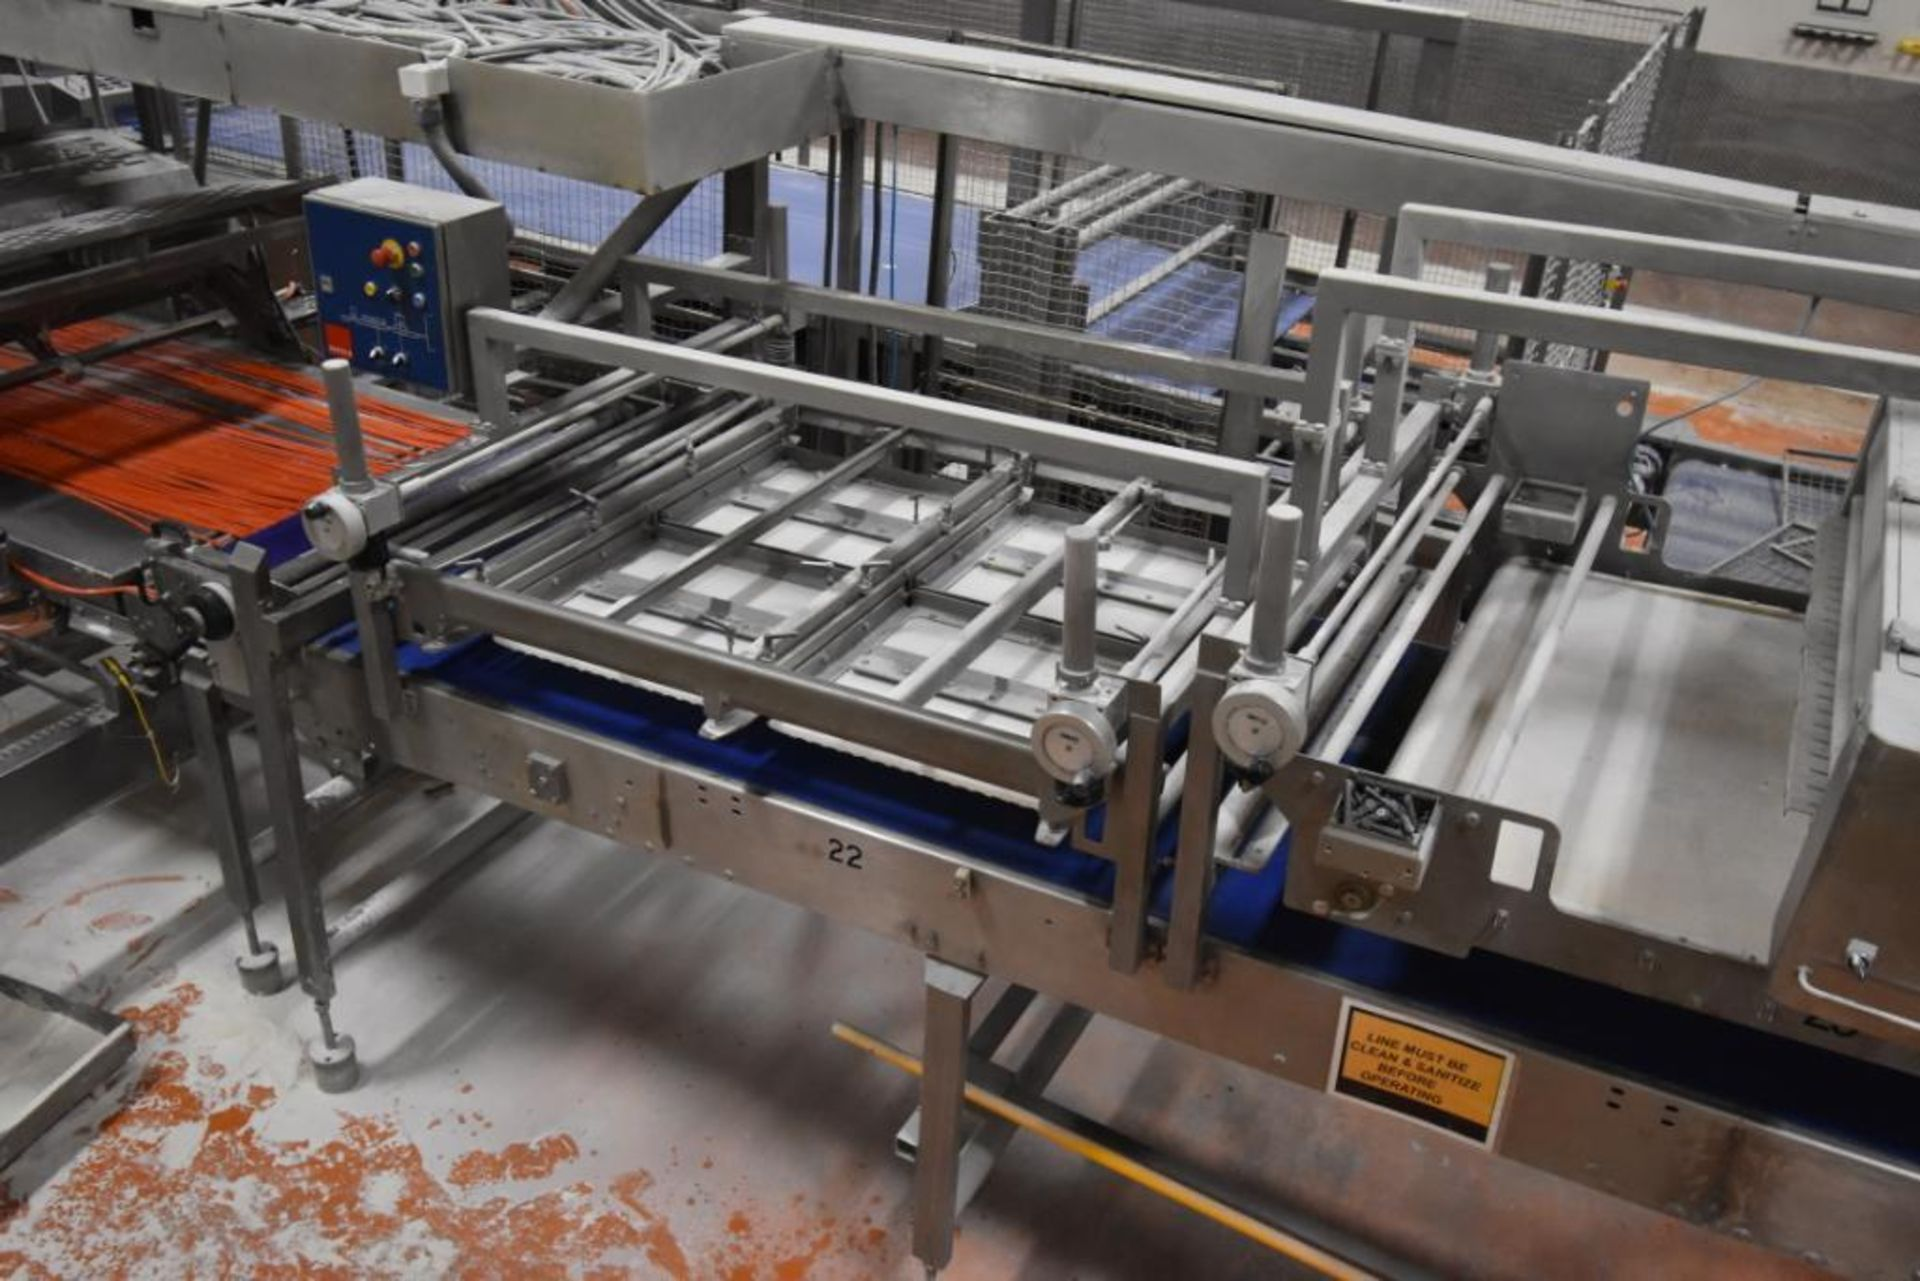 2007 Fritsch Laminator 3000 dough line - Image 241 of 280